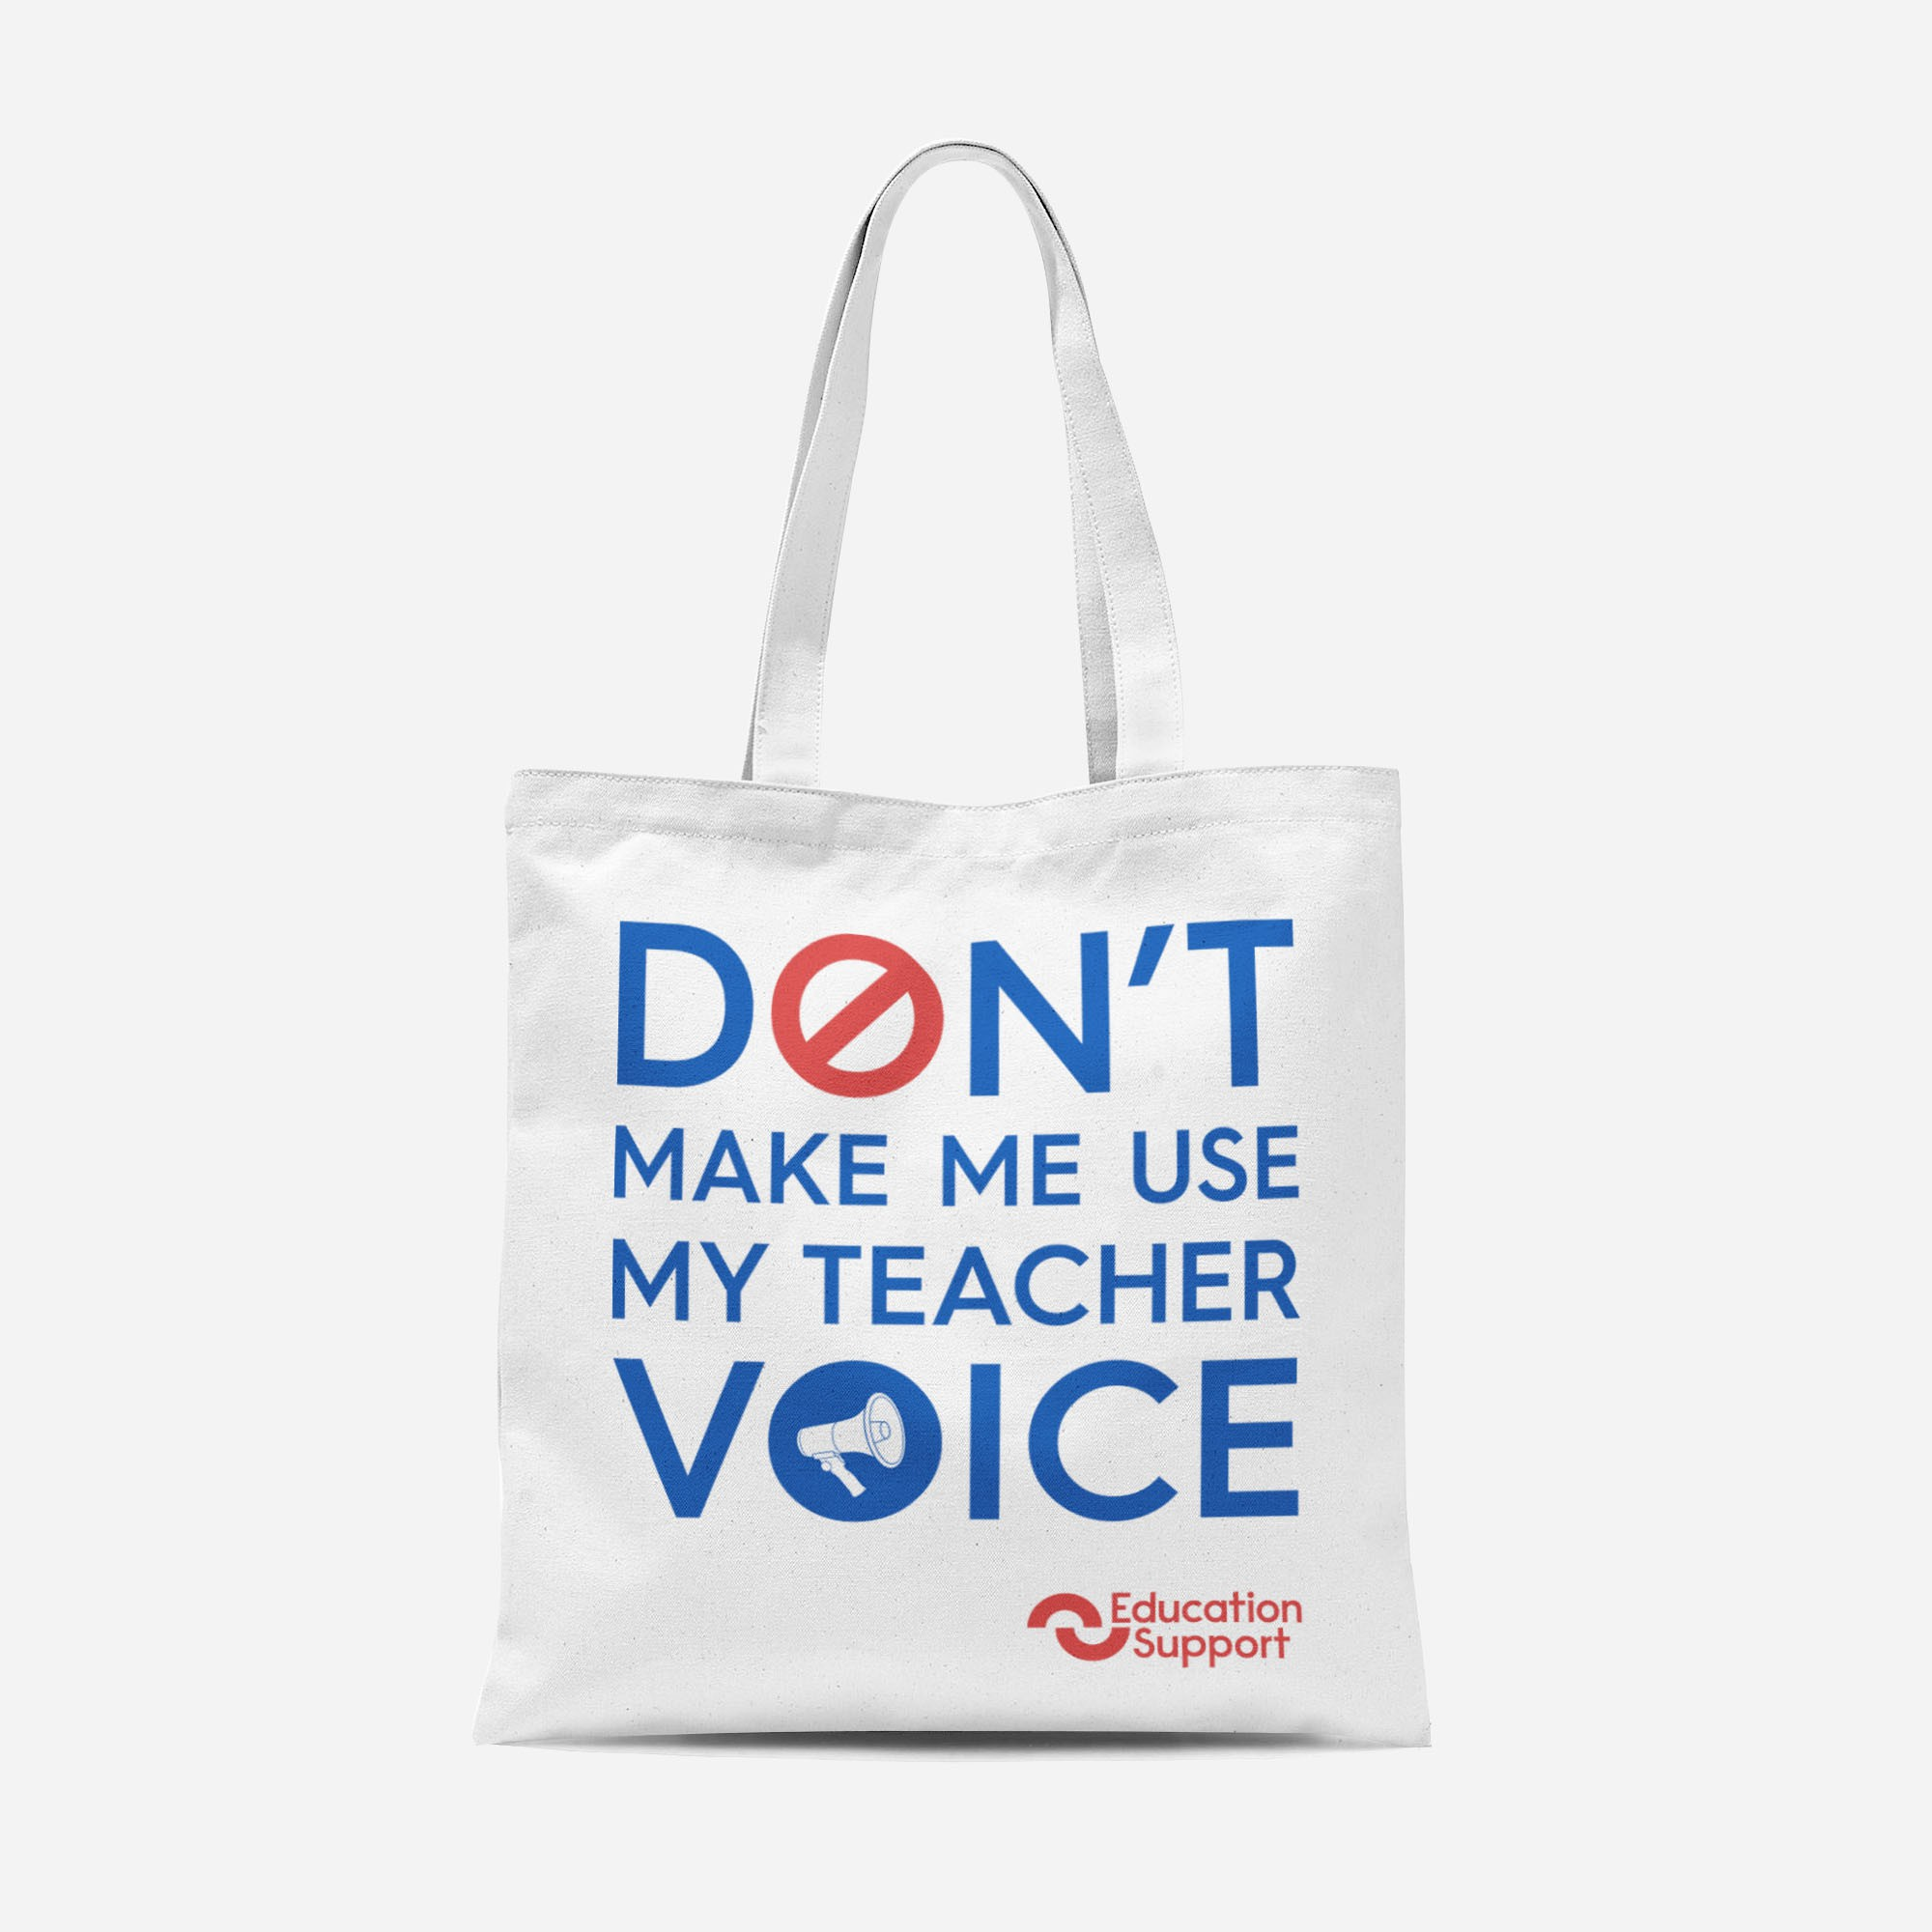 Design a fun tote bag for teachers!